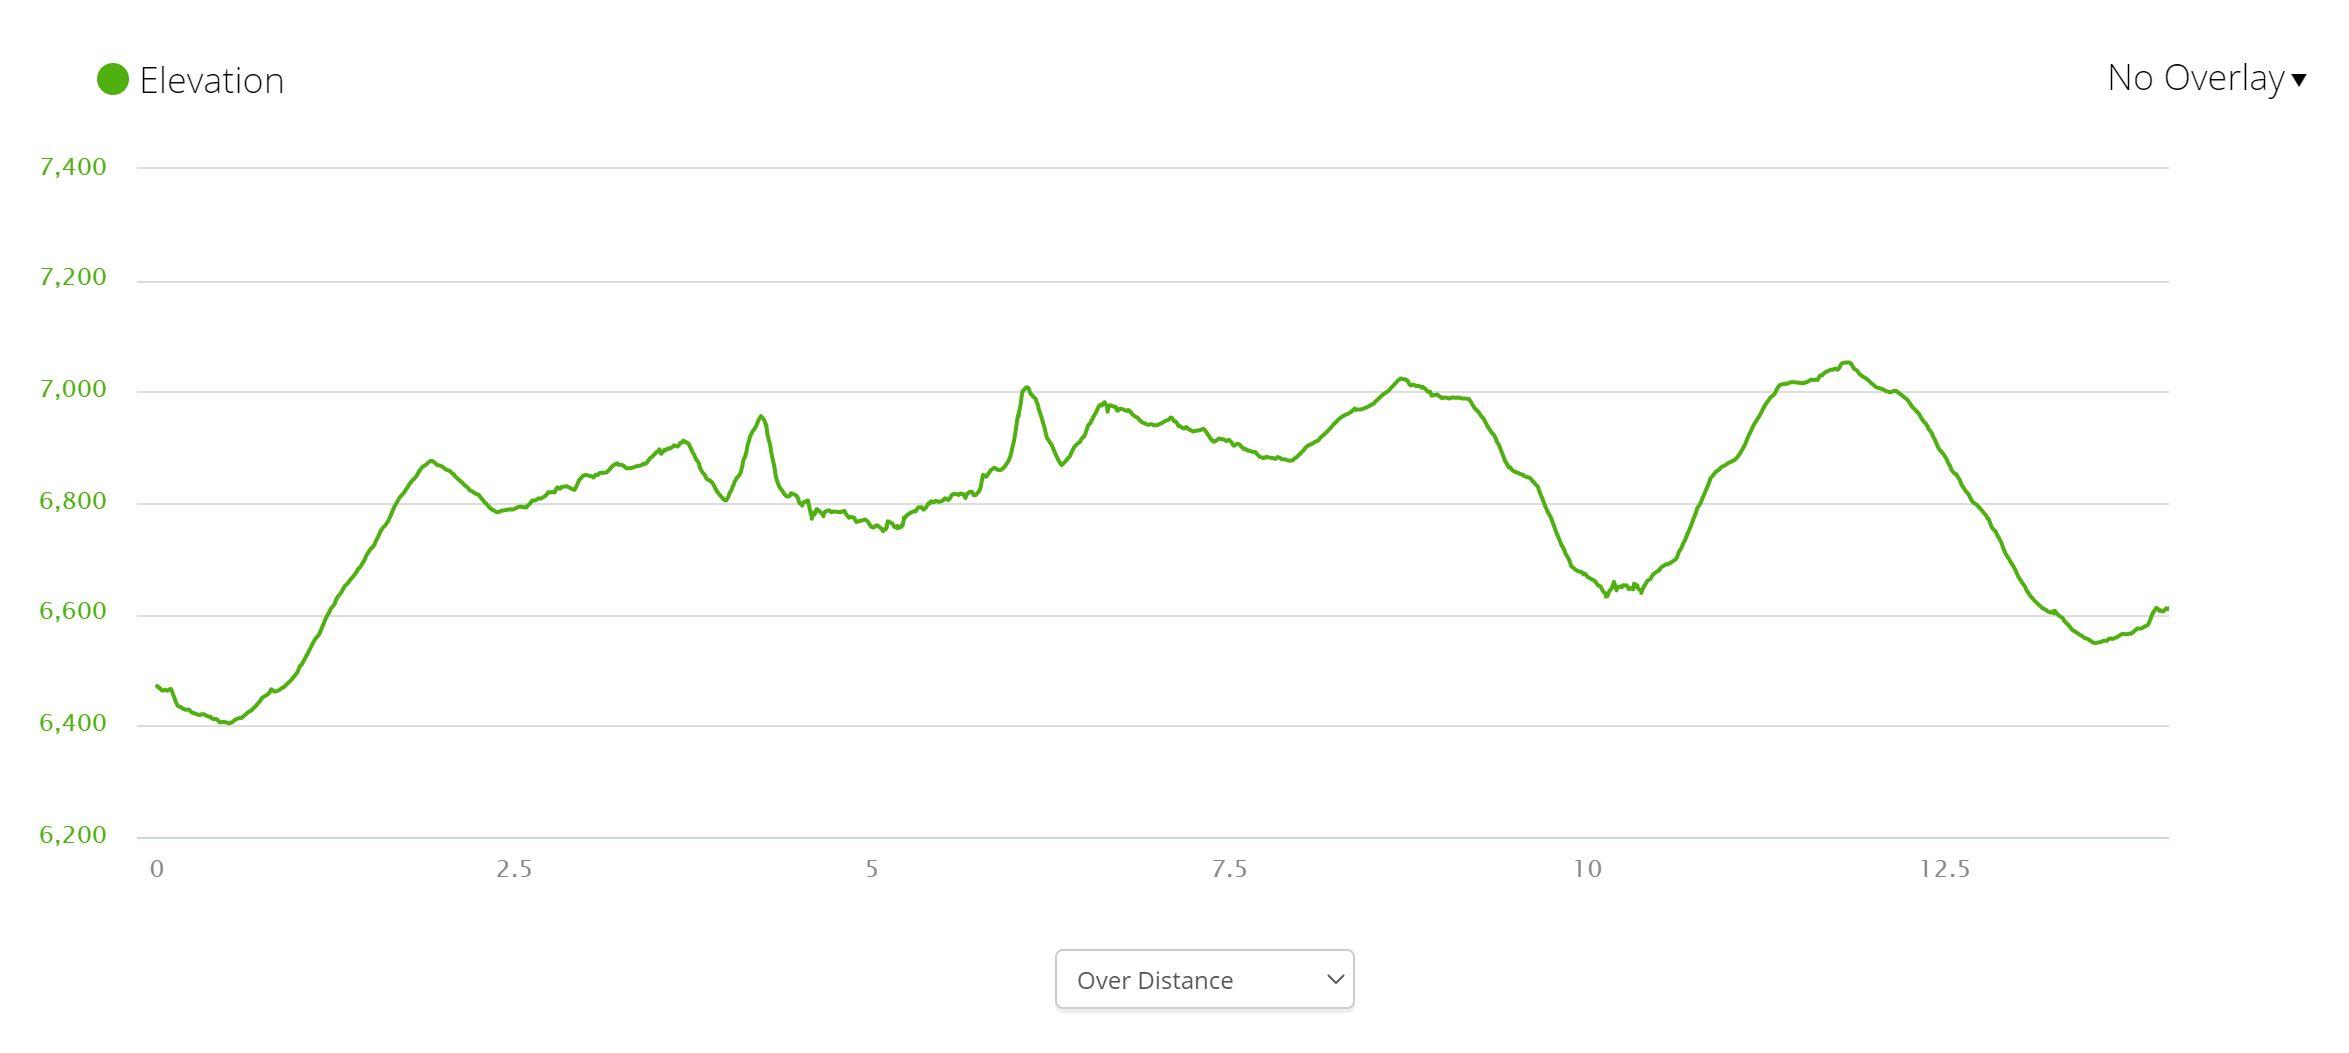 Deertrap & Cable Mts - Elevation